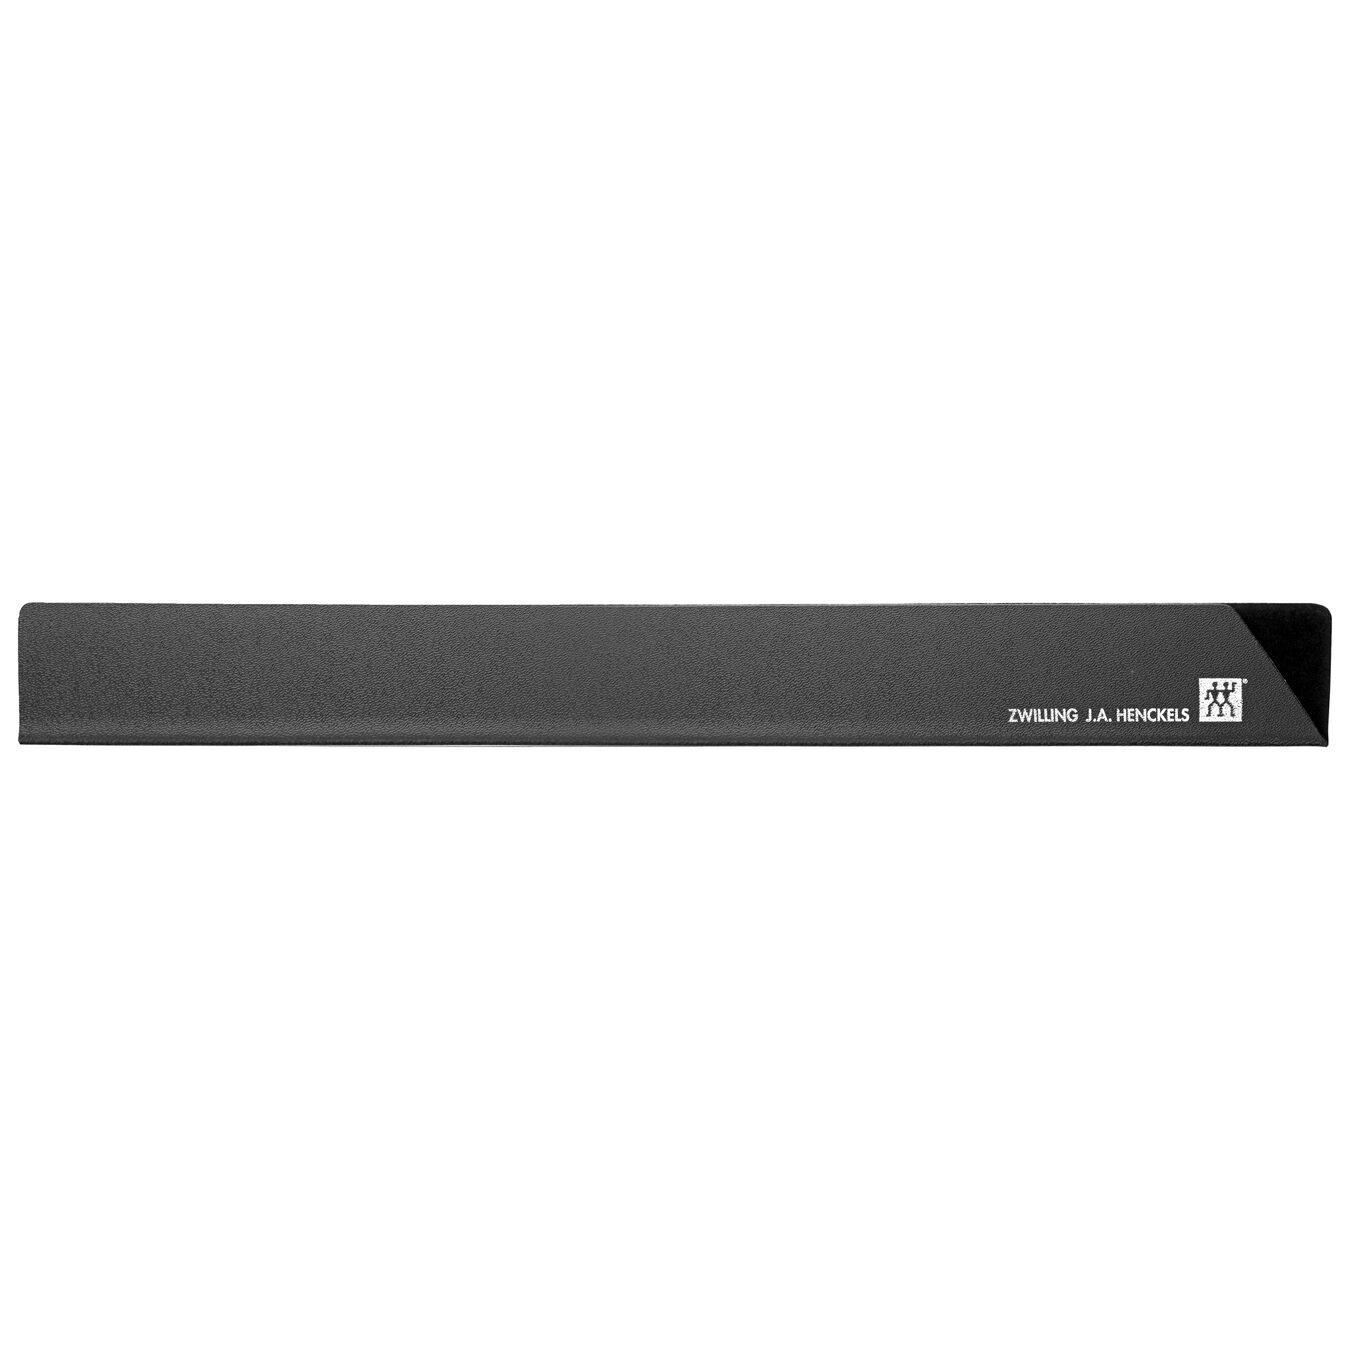 Bıçak Kılıfı, 31 cm | Siyah | Plastik,,large 1